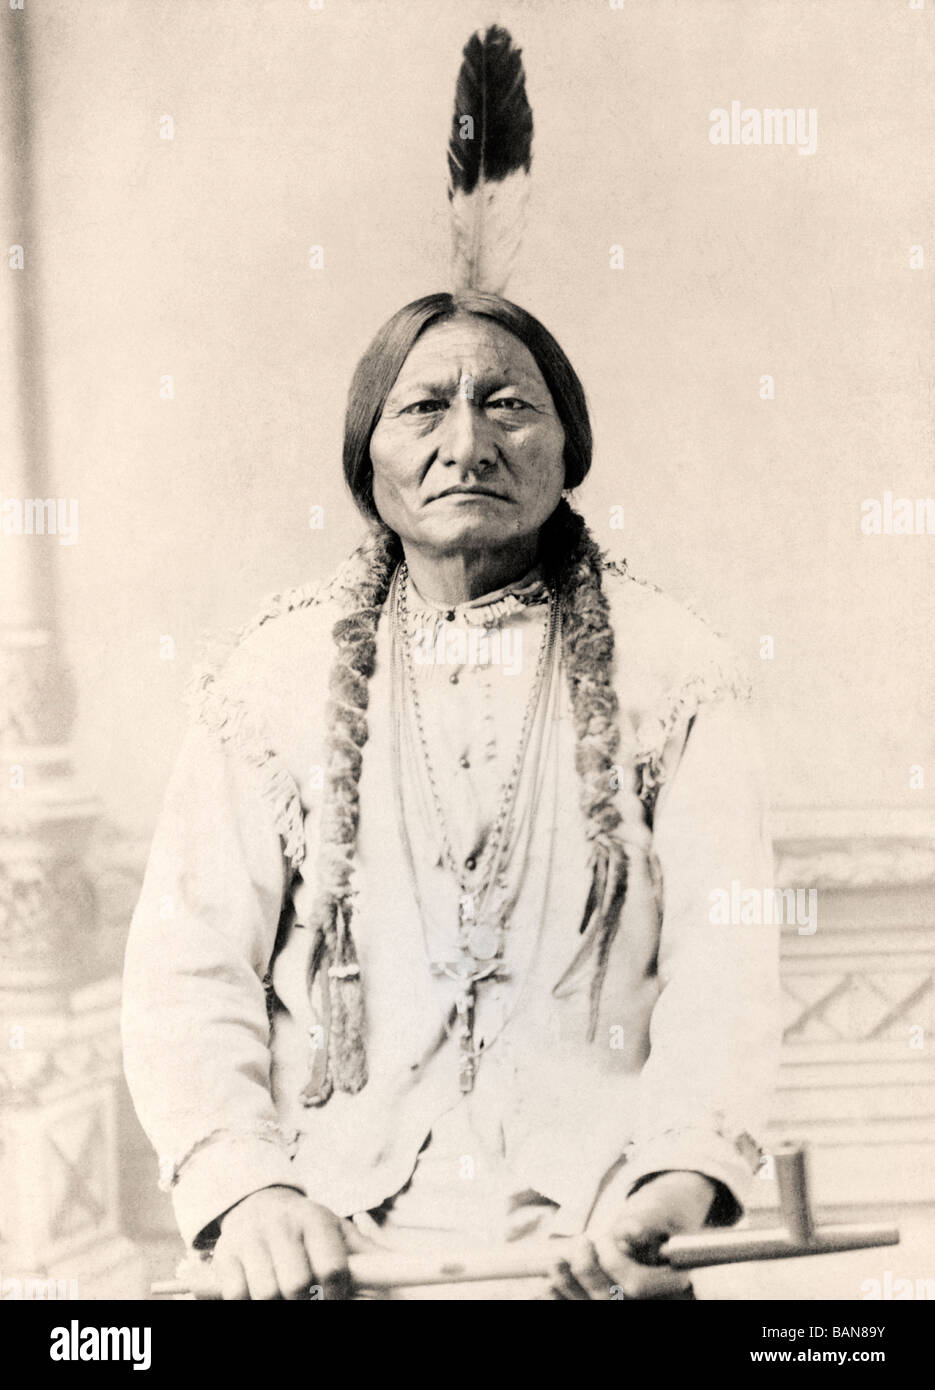 Sitting Bull, c.1831-1890.  Hunkpapa Lakota Sioux holy man. - Stock Image